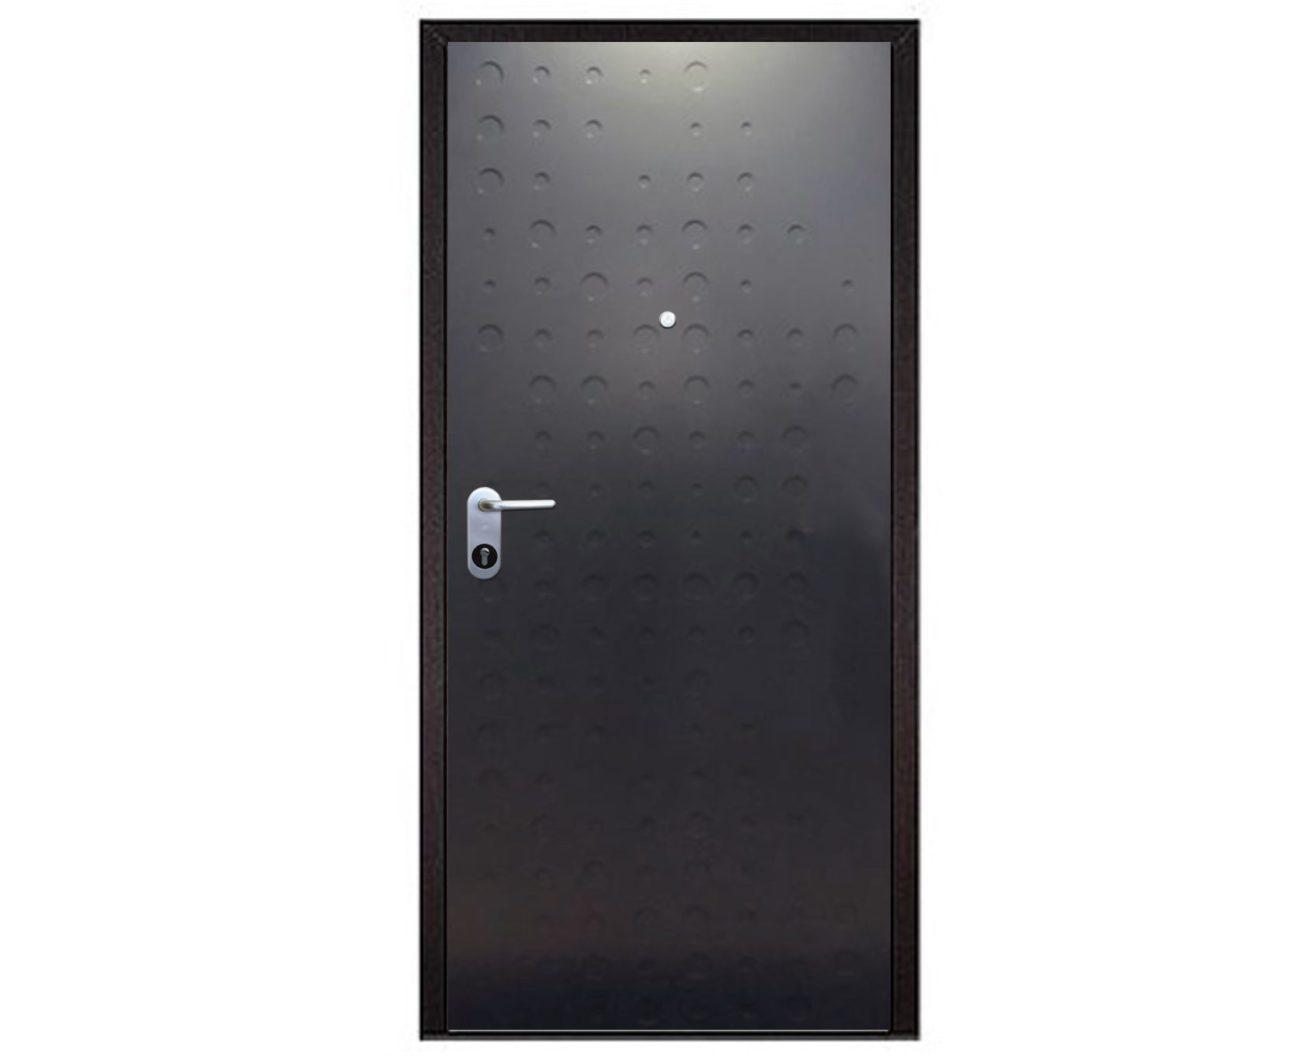 Protuprovalna vrata - Industrijski dizajn 1